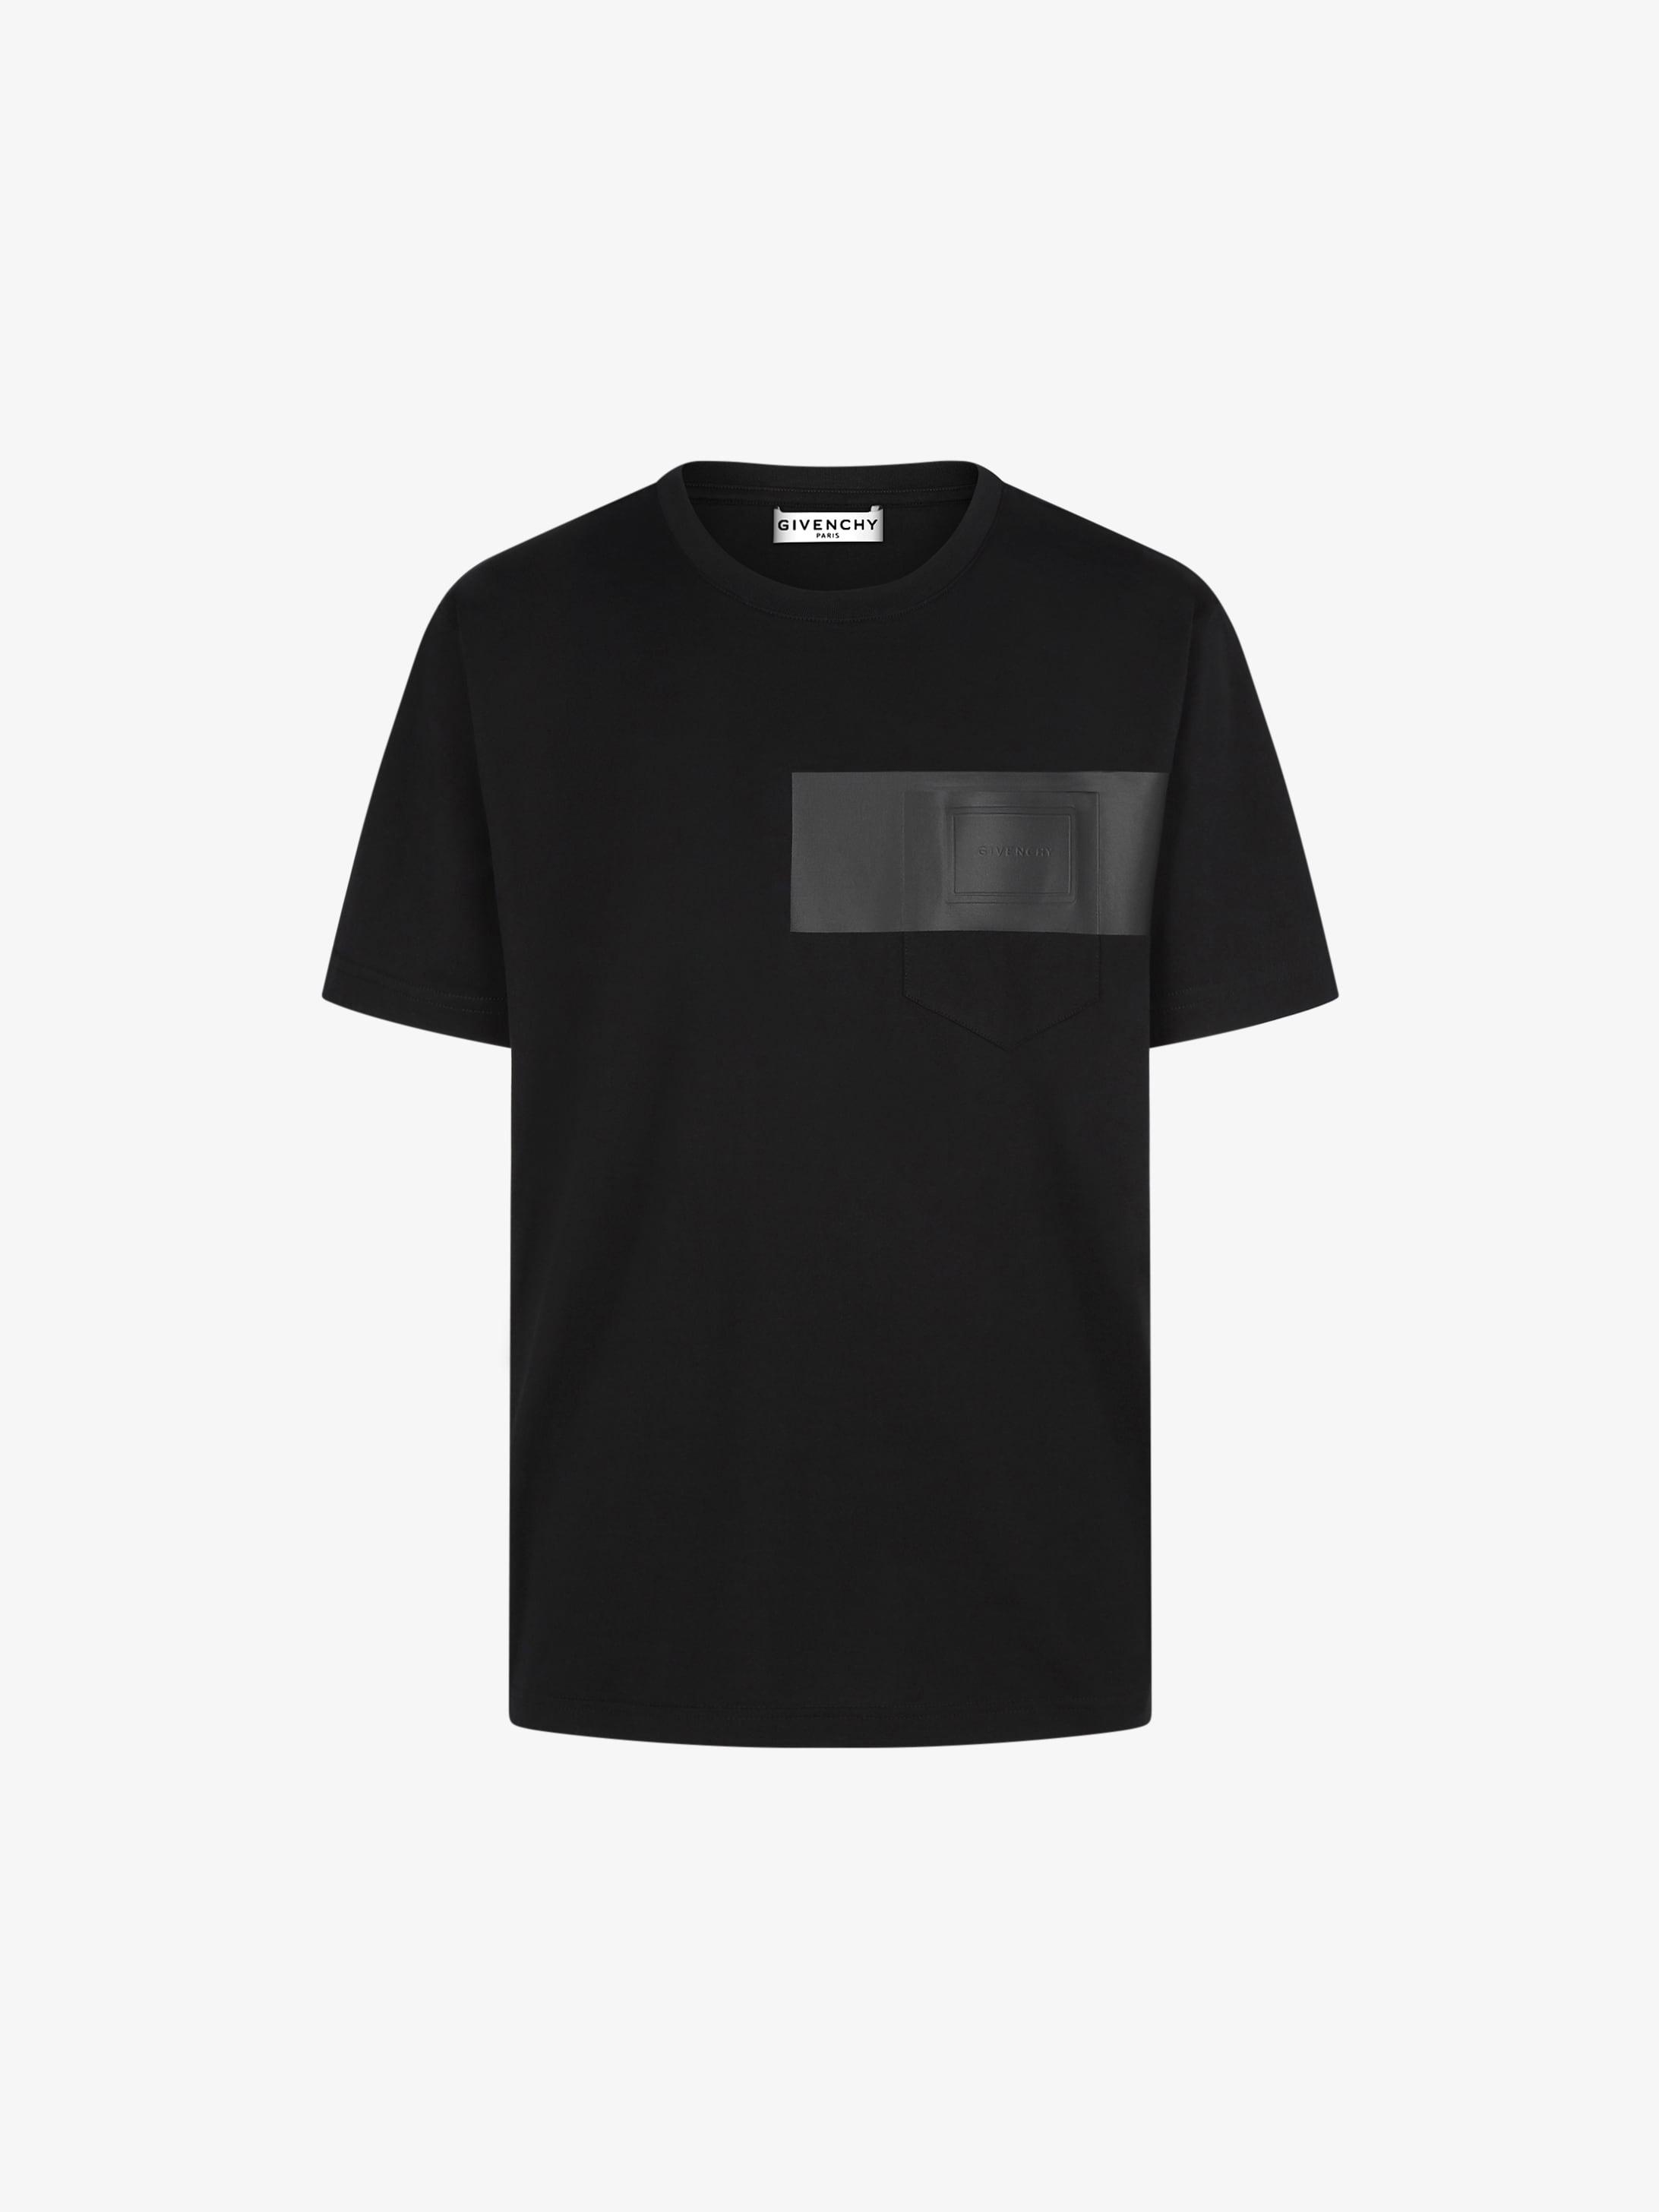 T-shirt GIVENCHY con applicazione